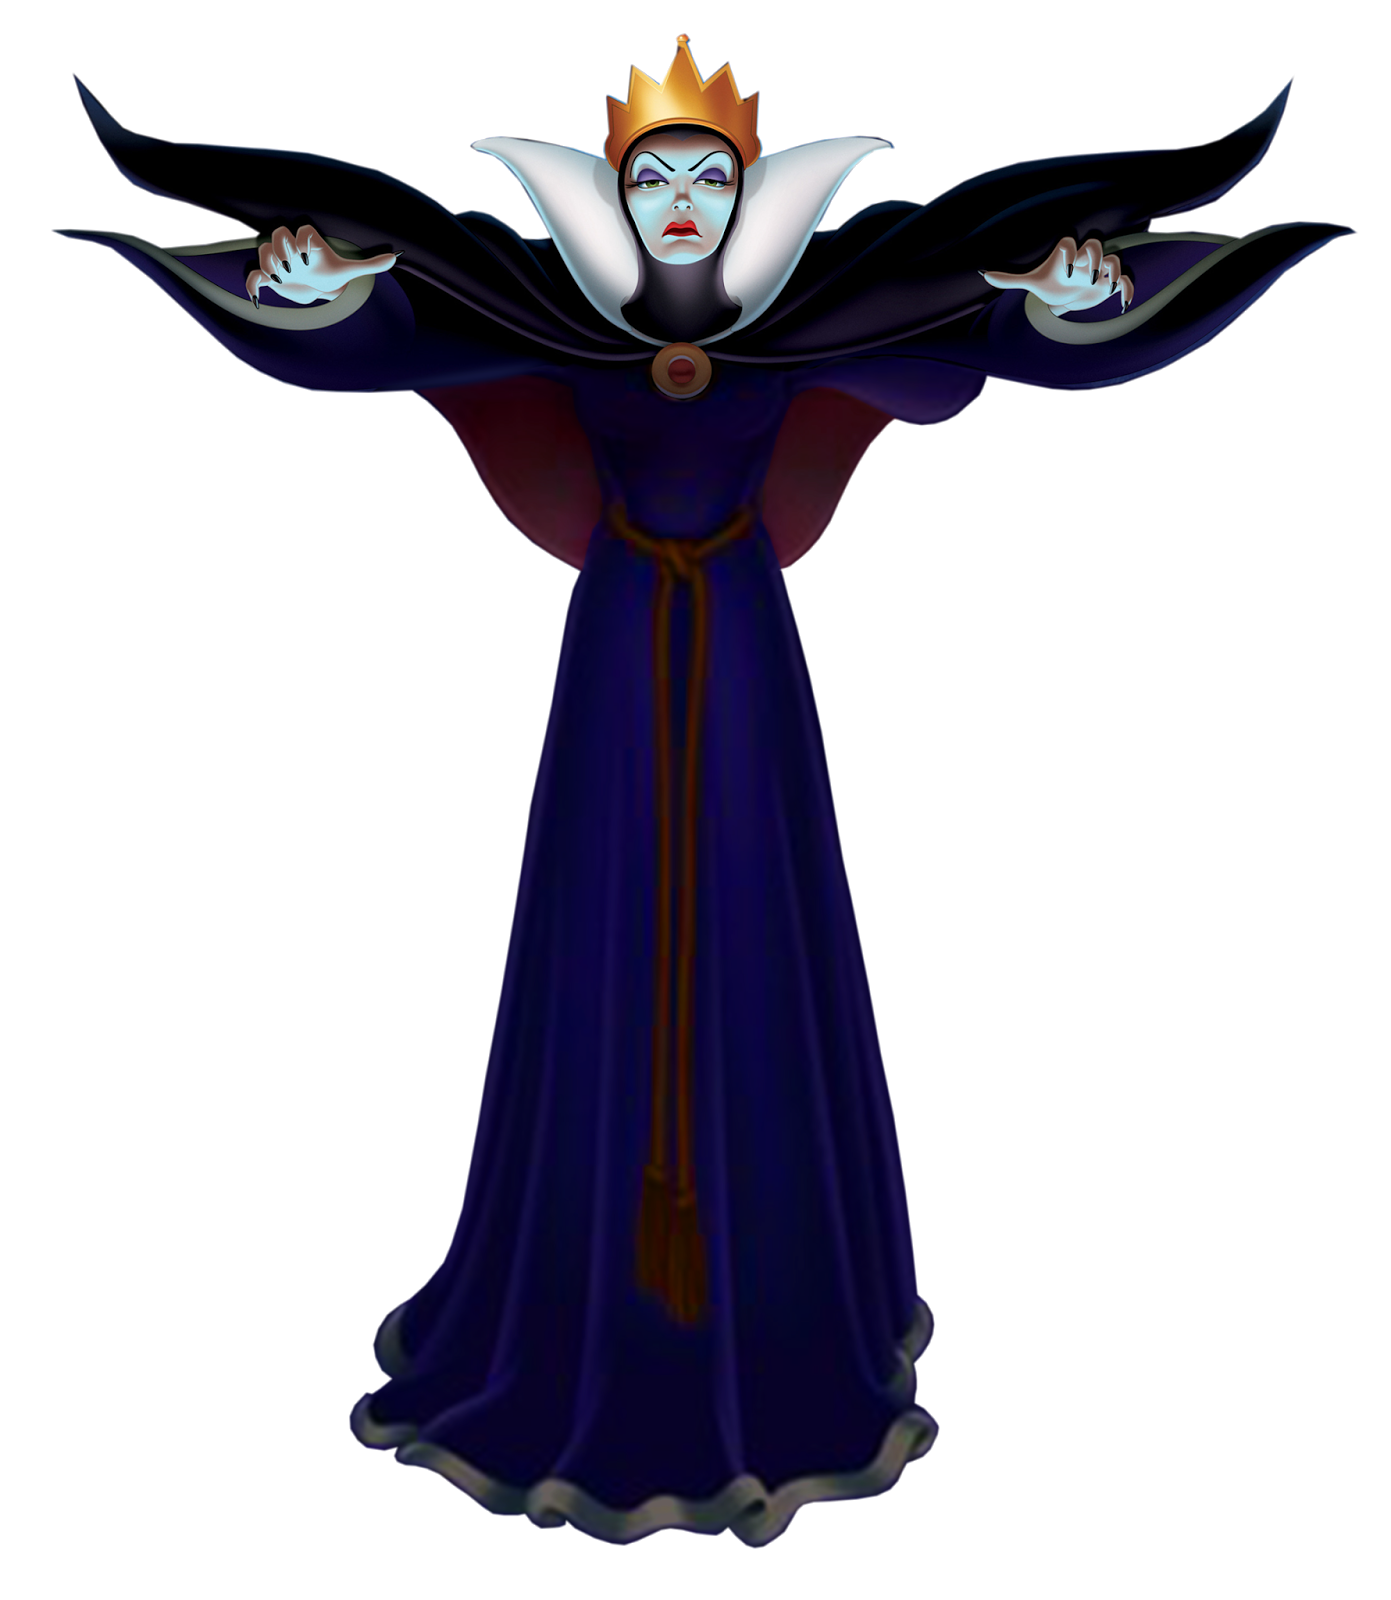 A very merry un. Queen clipart evil queen